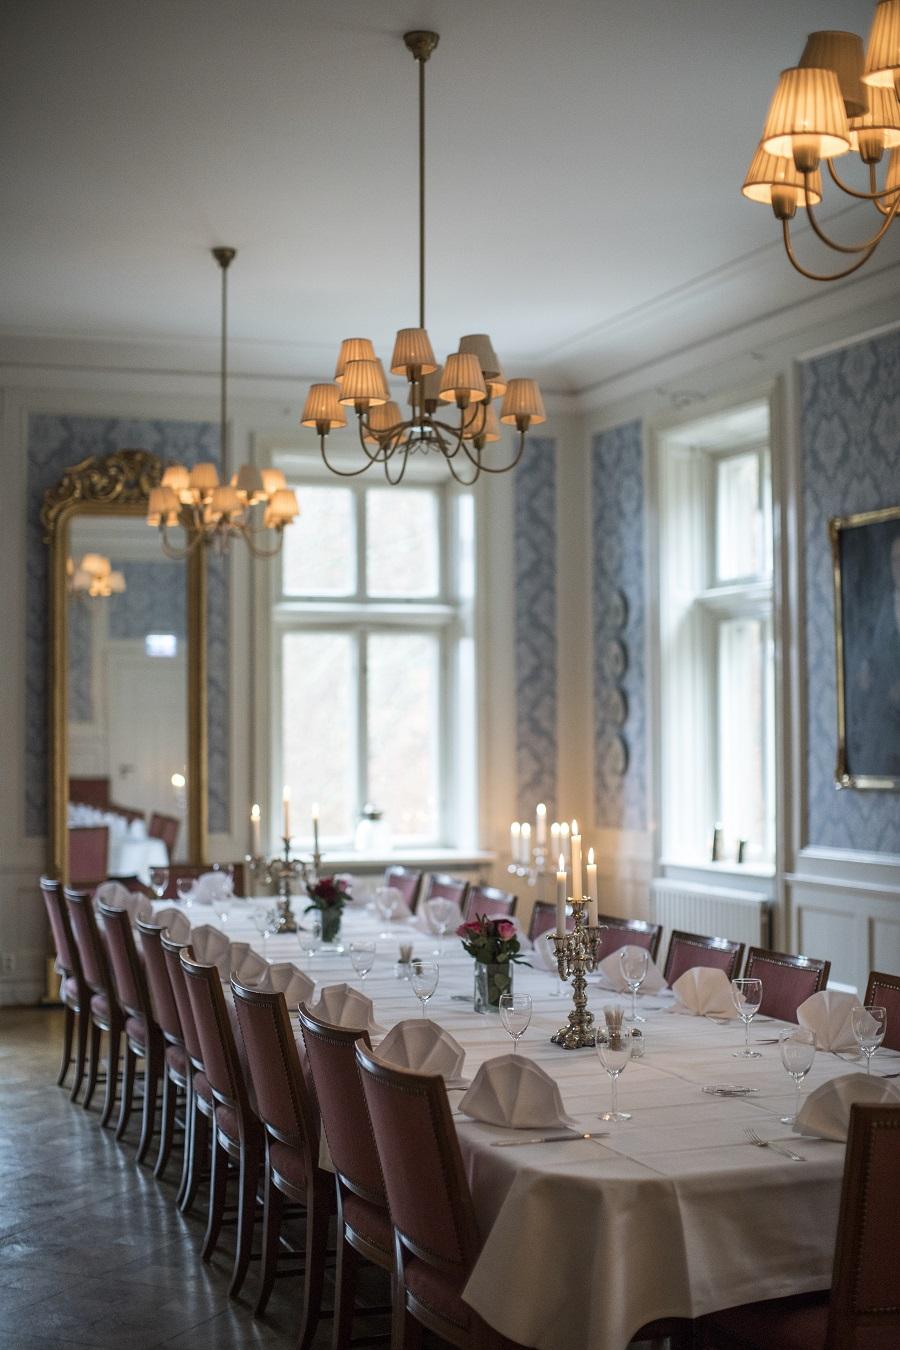 Introducing the Småland Region of Sweden - Slottsvillan